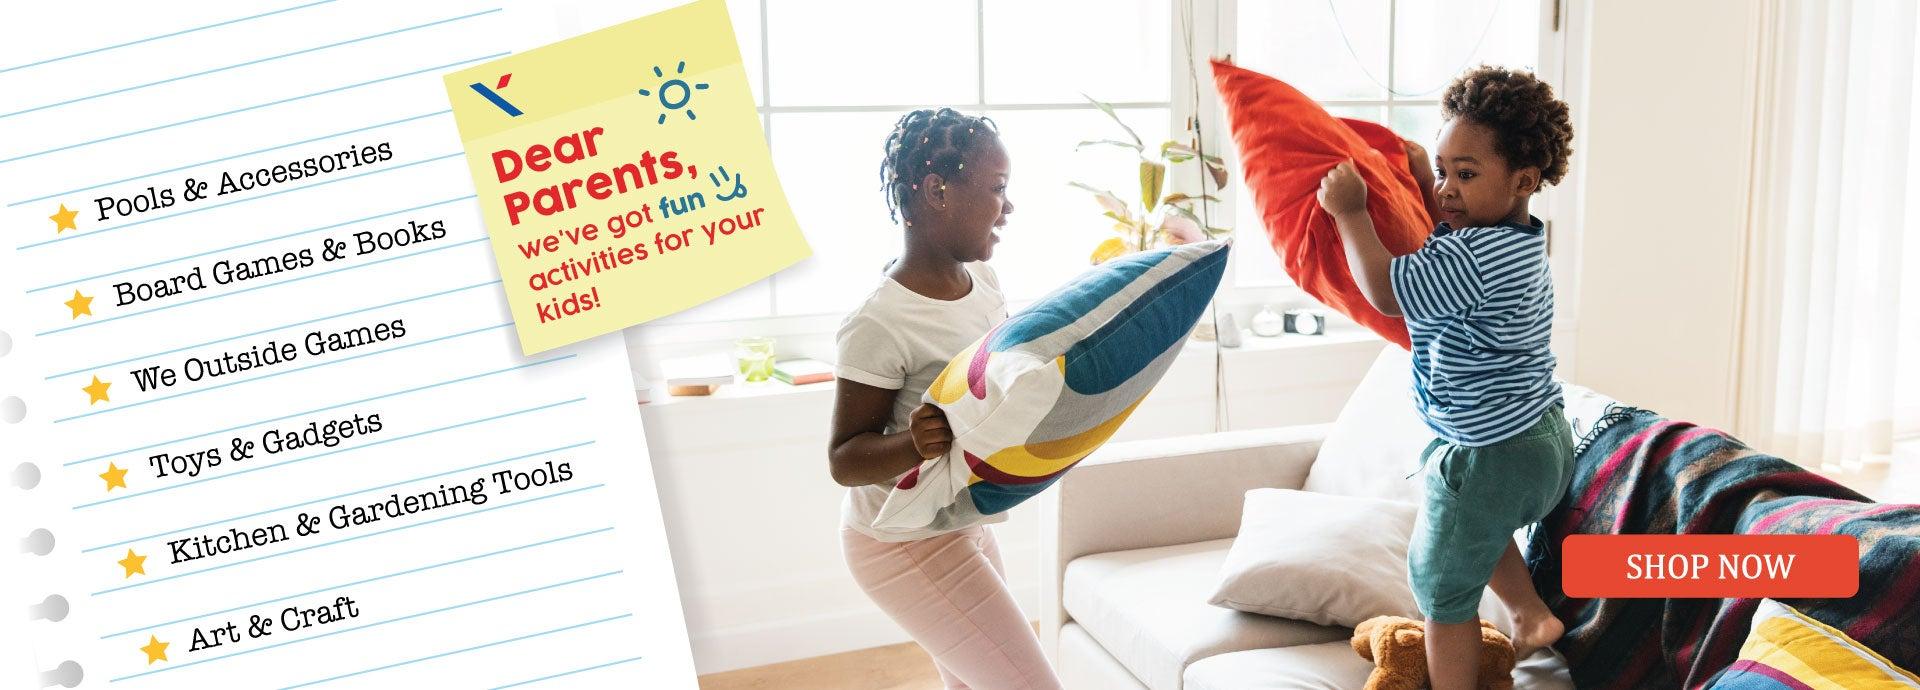 Dear Parents, we've got fun activities for your kids!